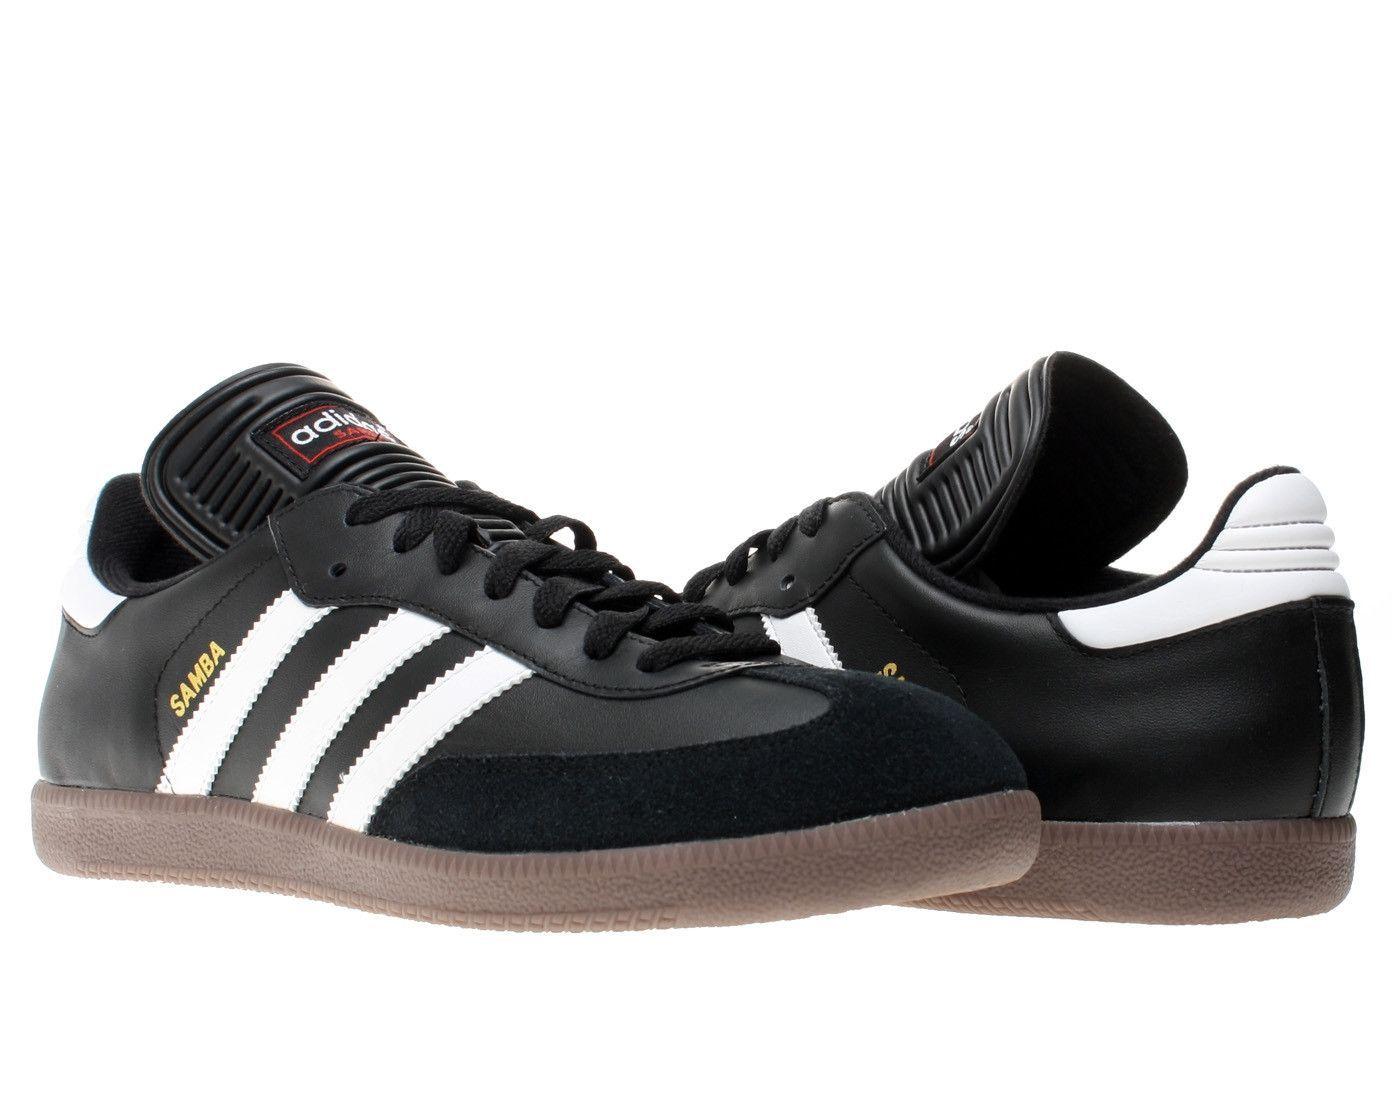 58908b8c132 Adidas Men s Samba Classic Soccer Shoe